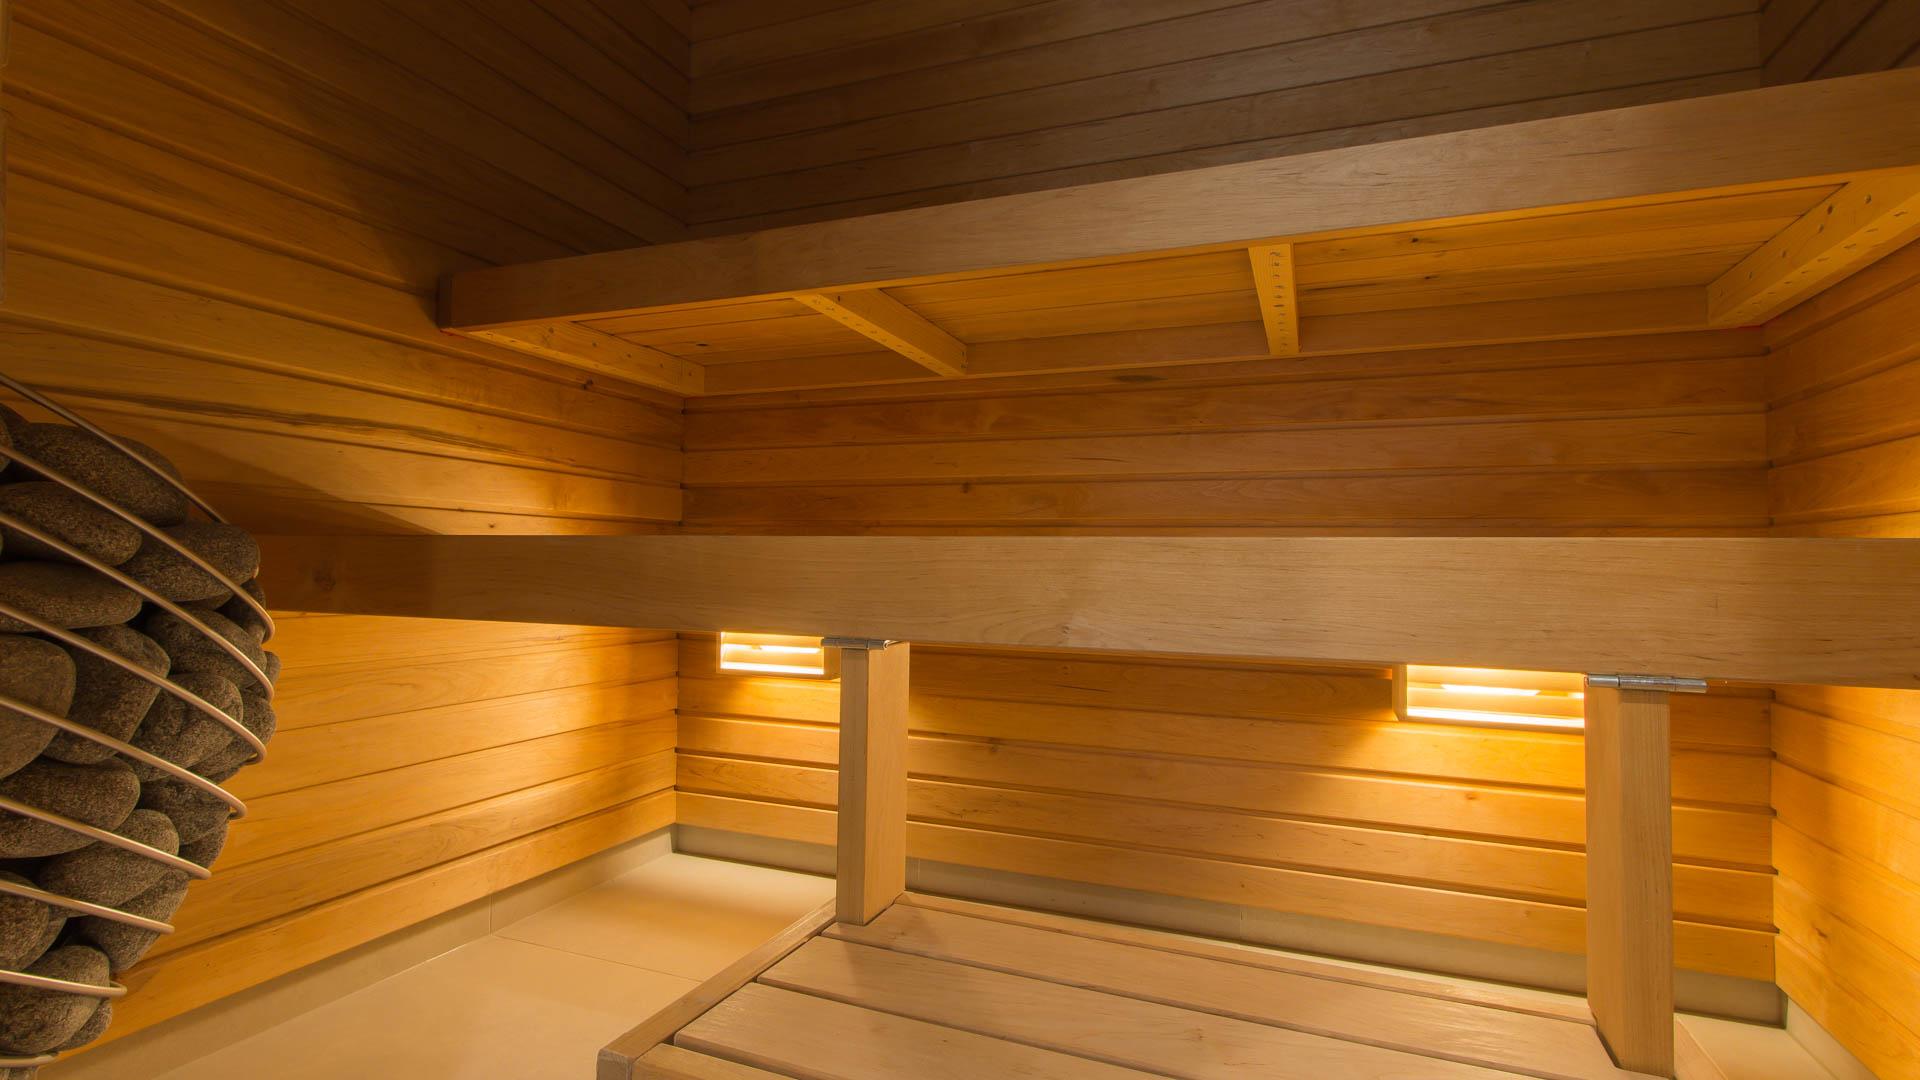 Lõõgastu oma saunas!